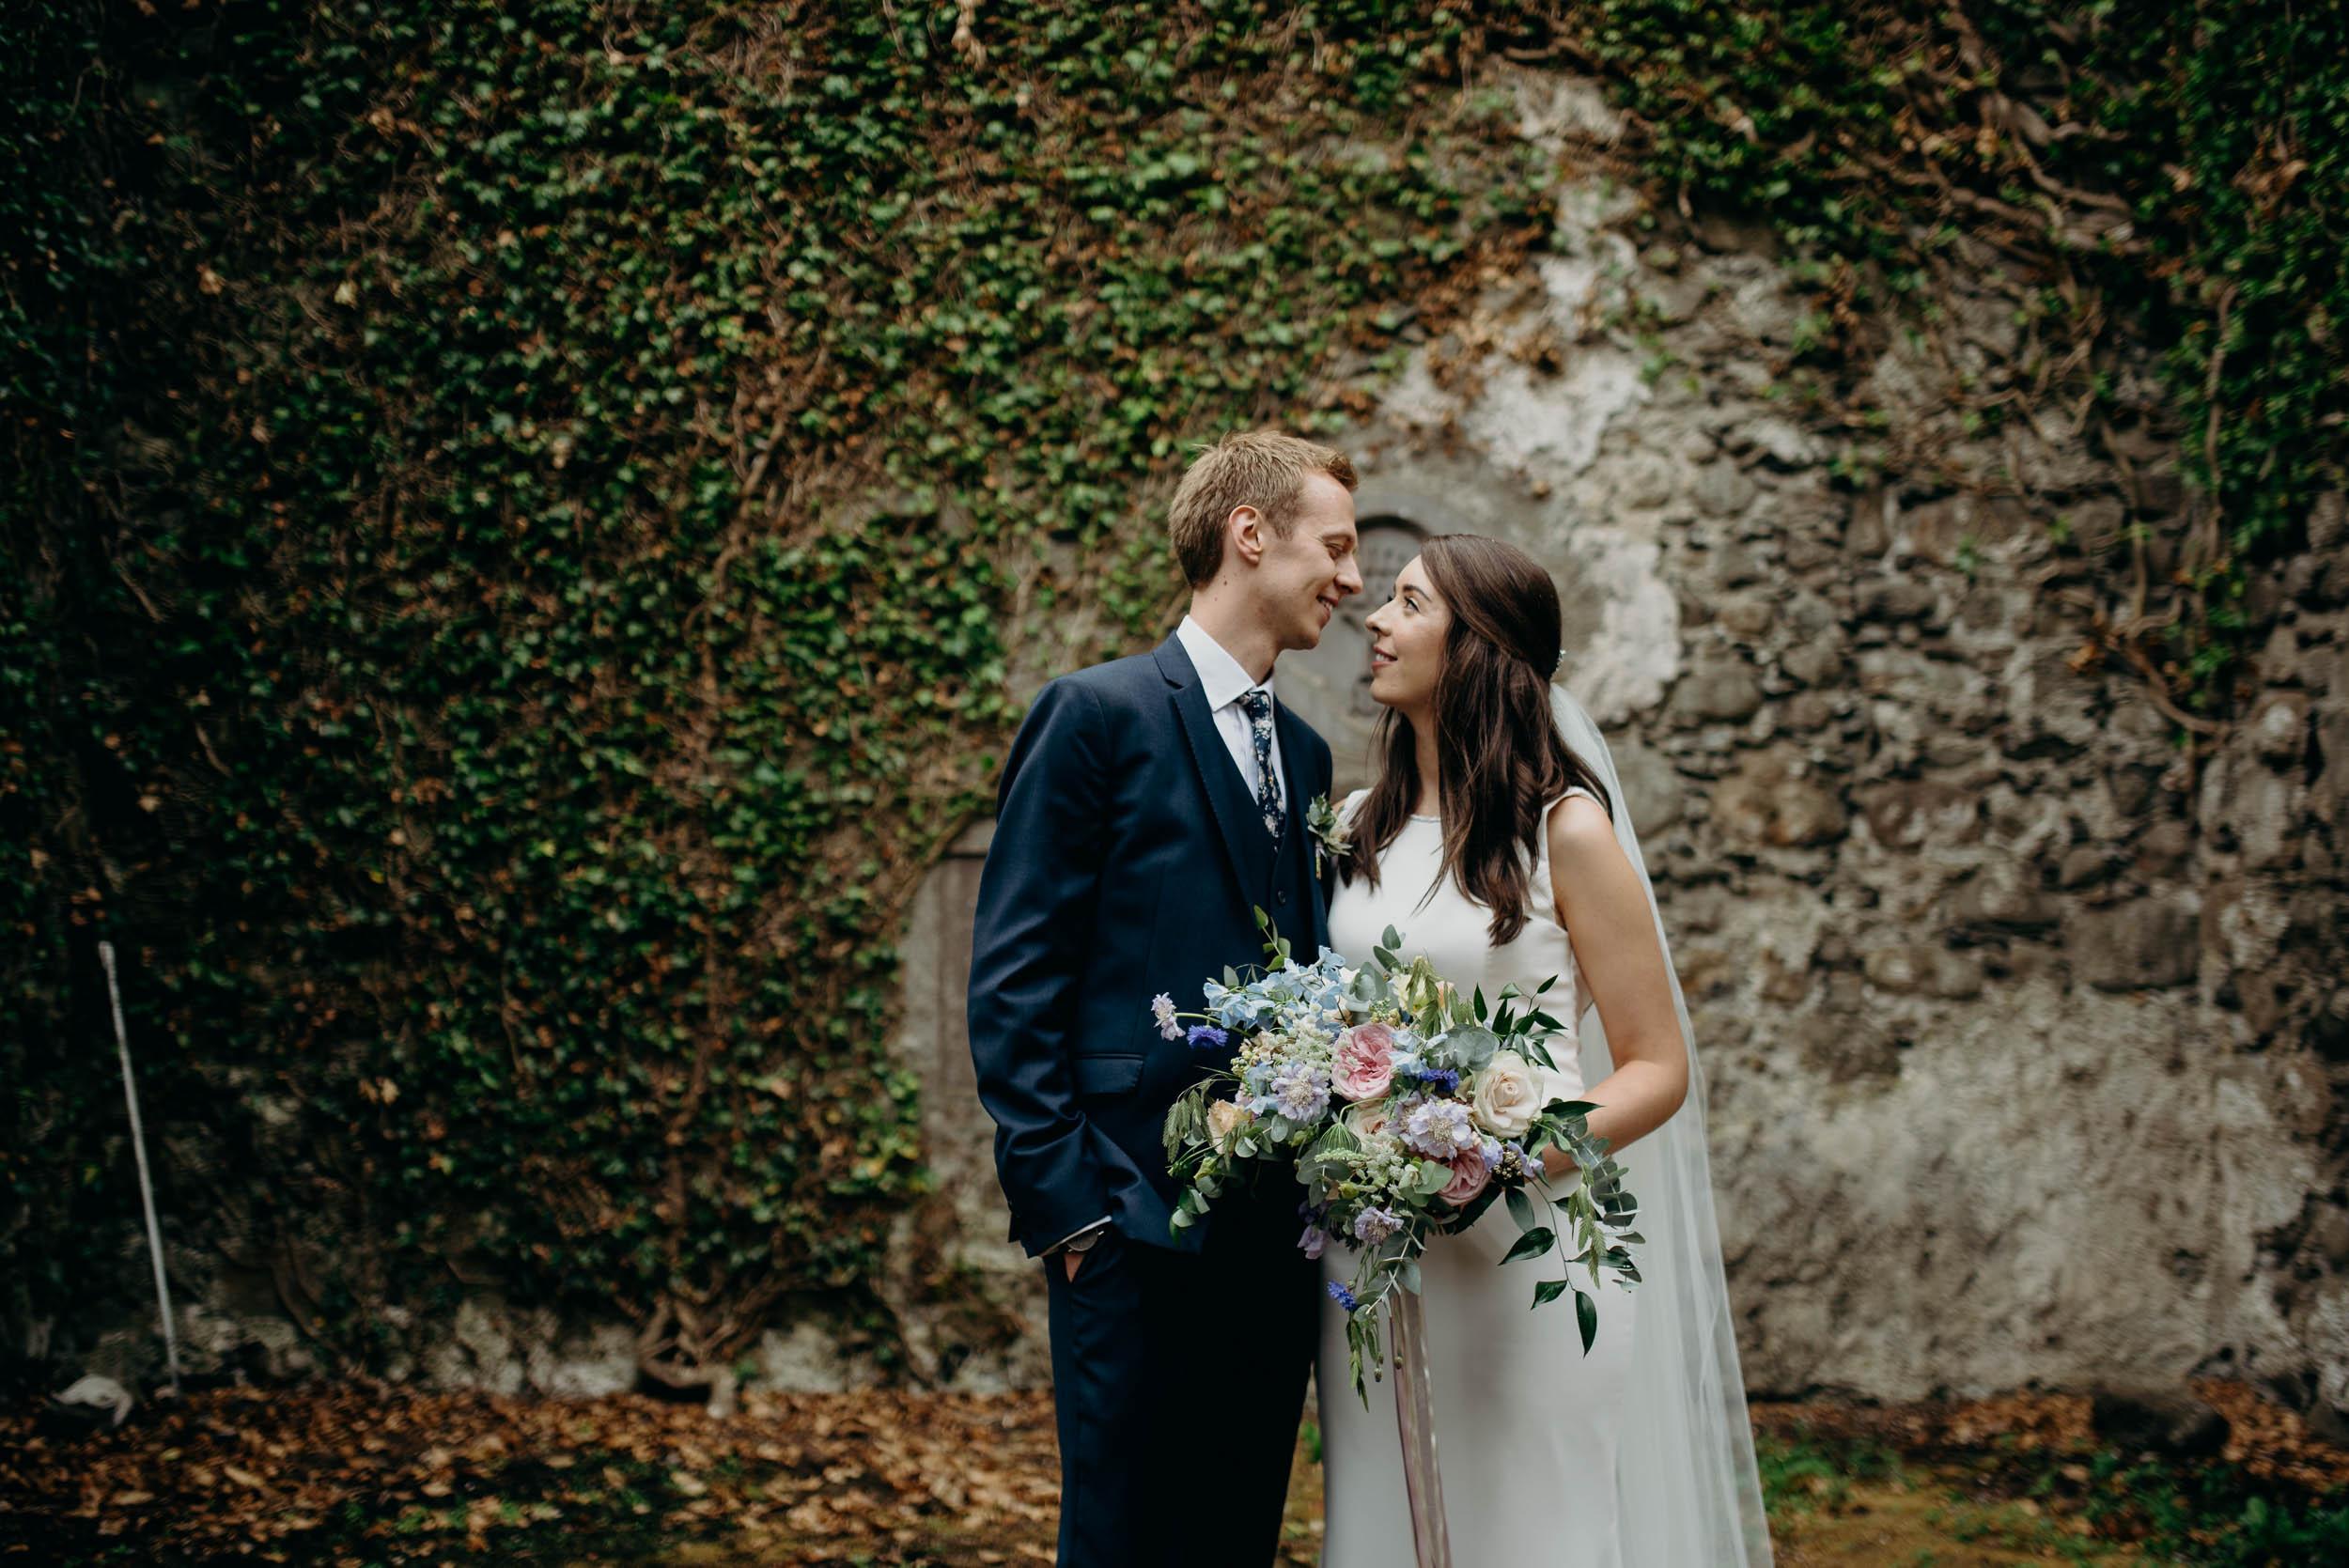 ivory pavillion wedding northern ireland-105.jpg